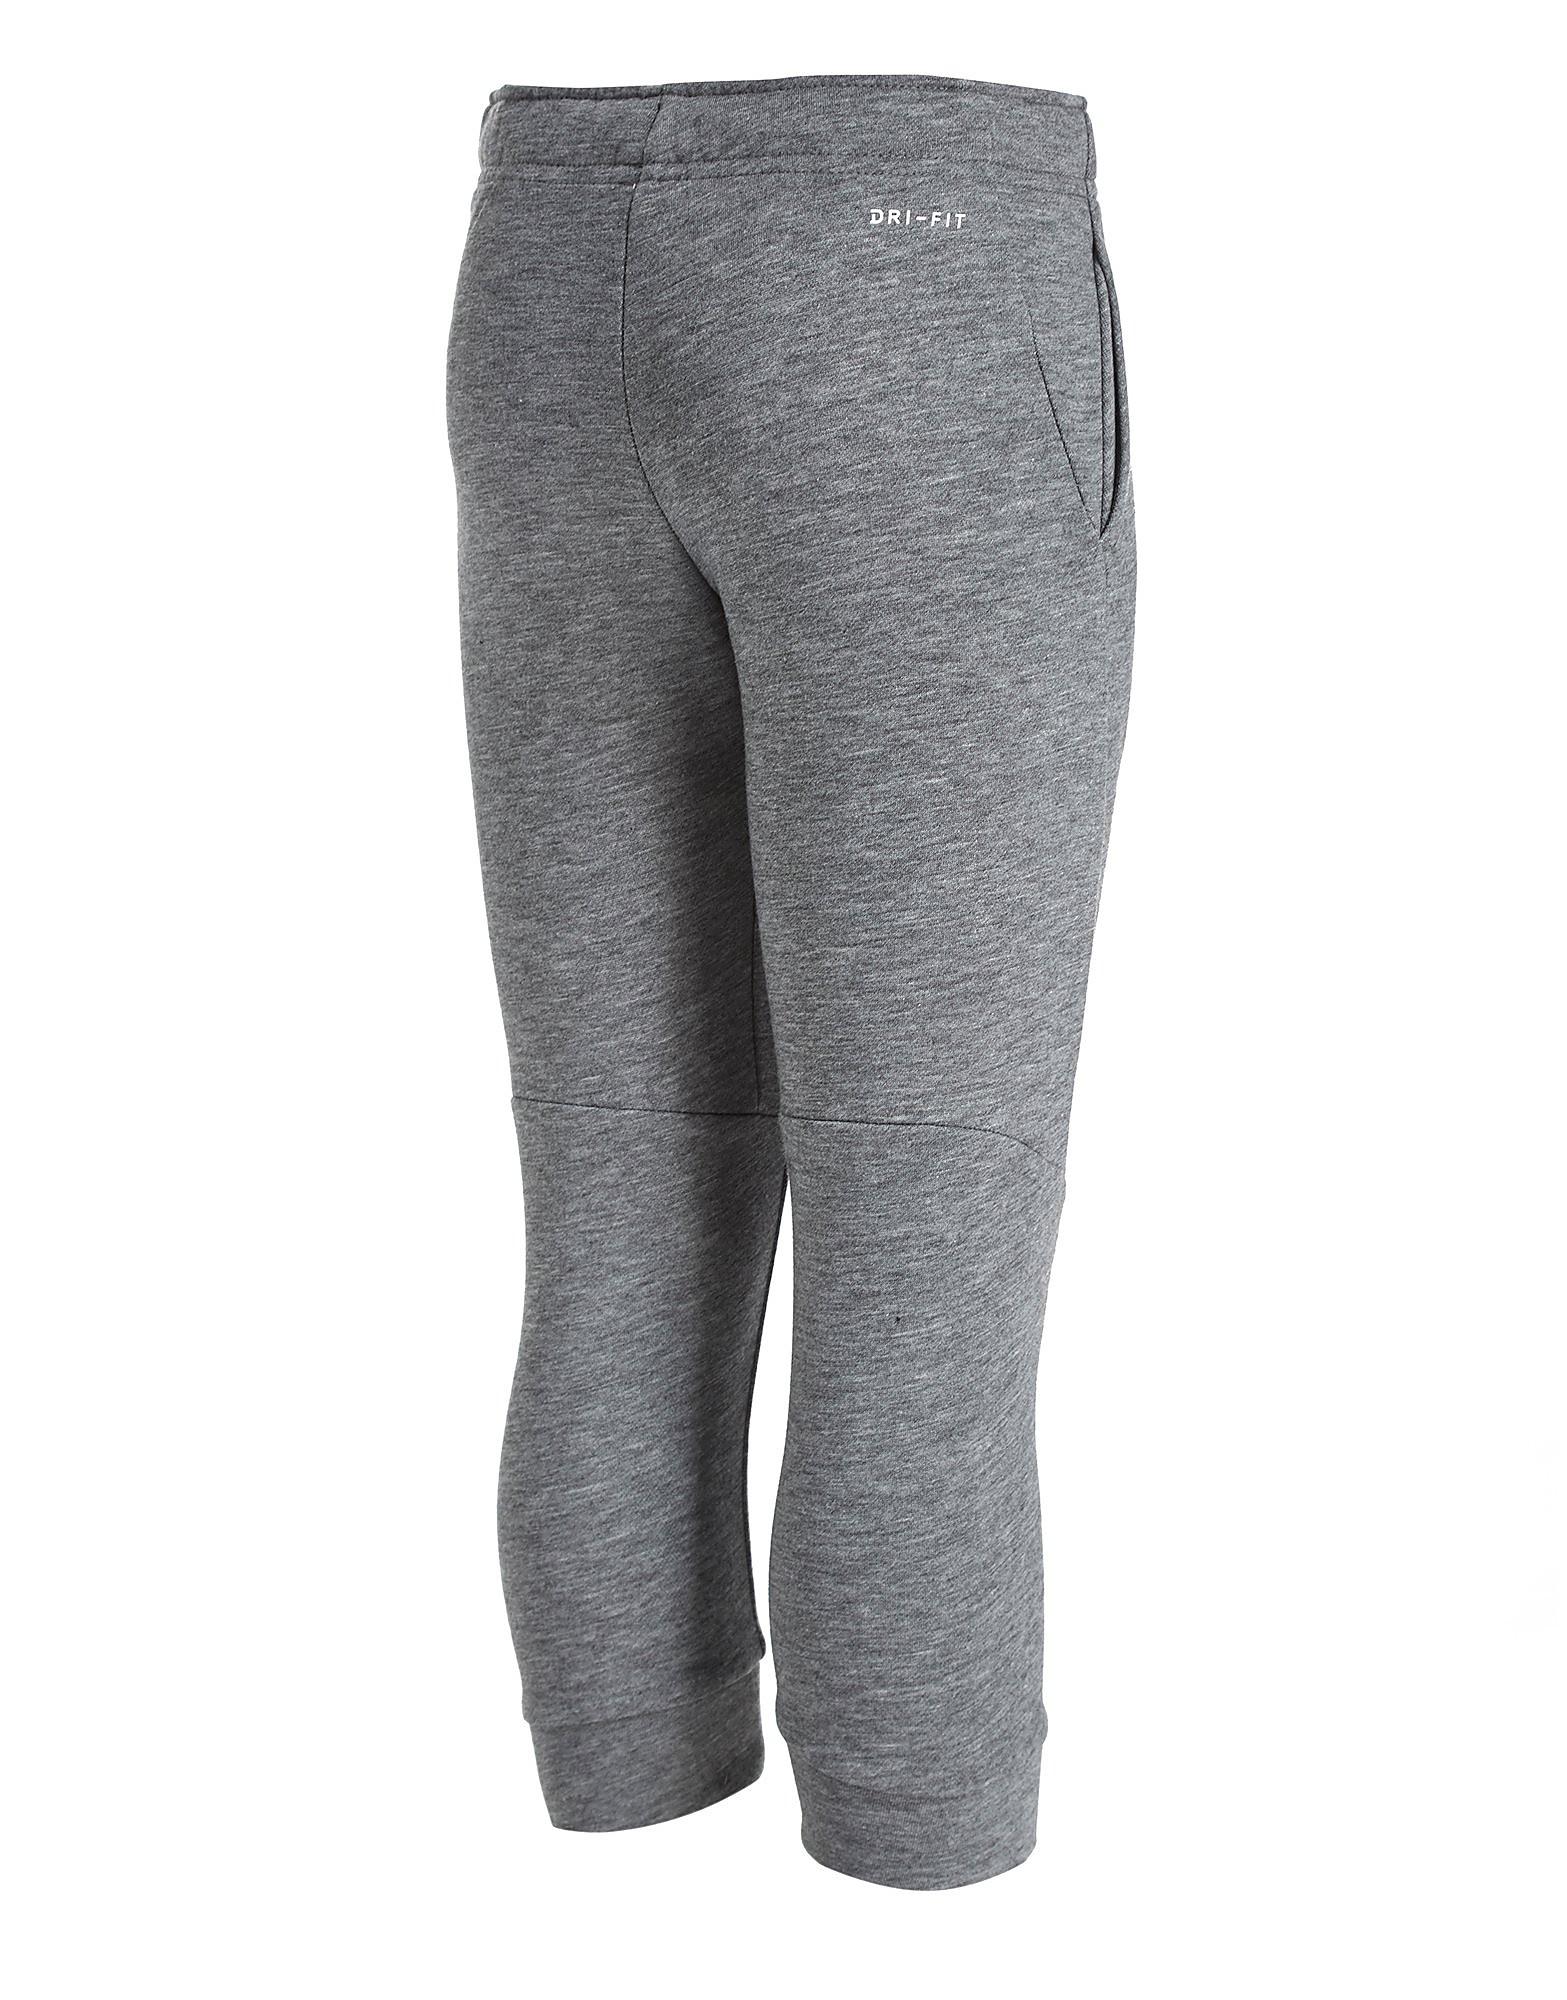 Nike Dri-FIT Tapered Pants Children